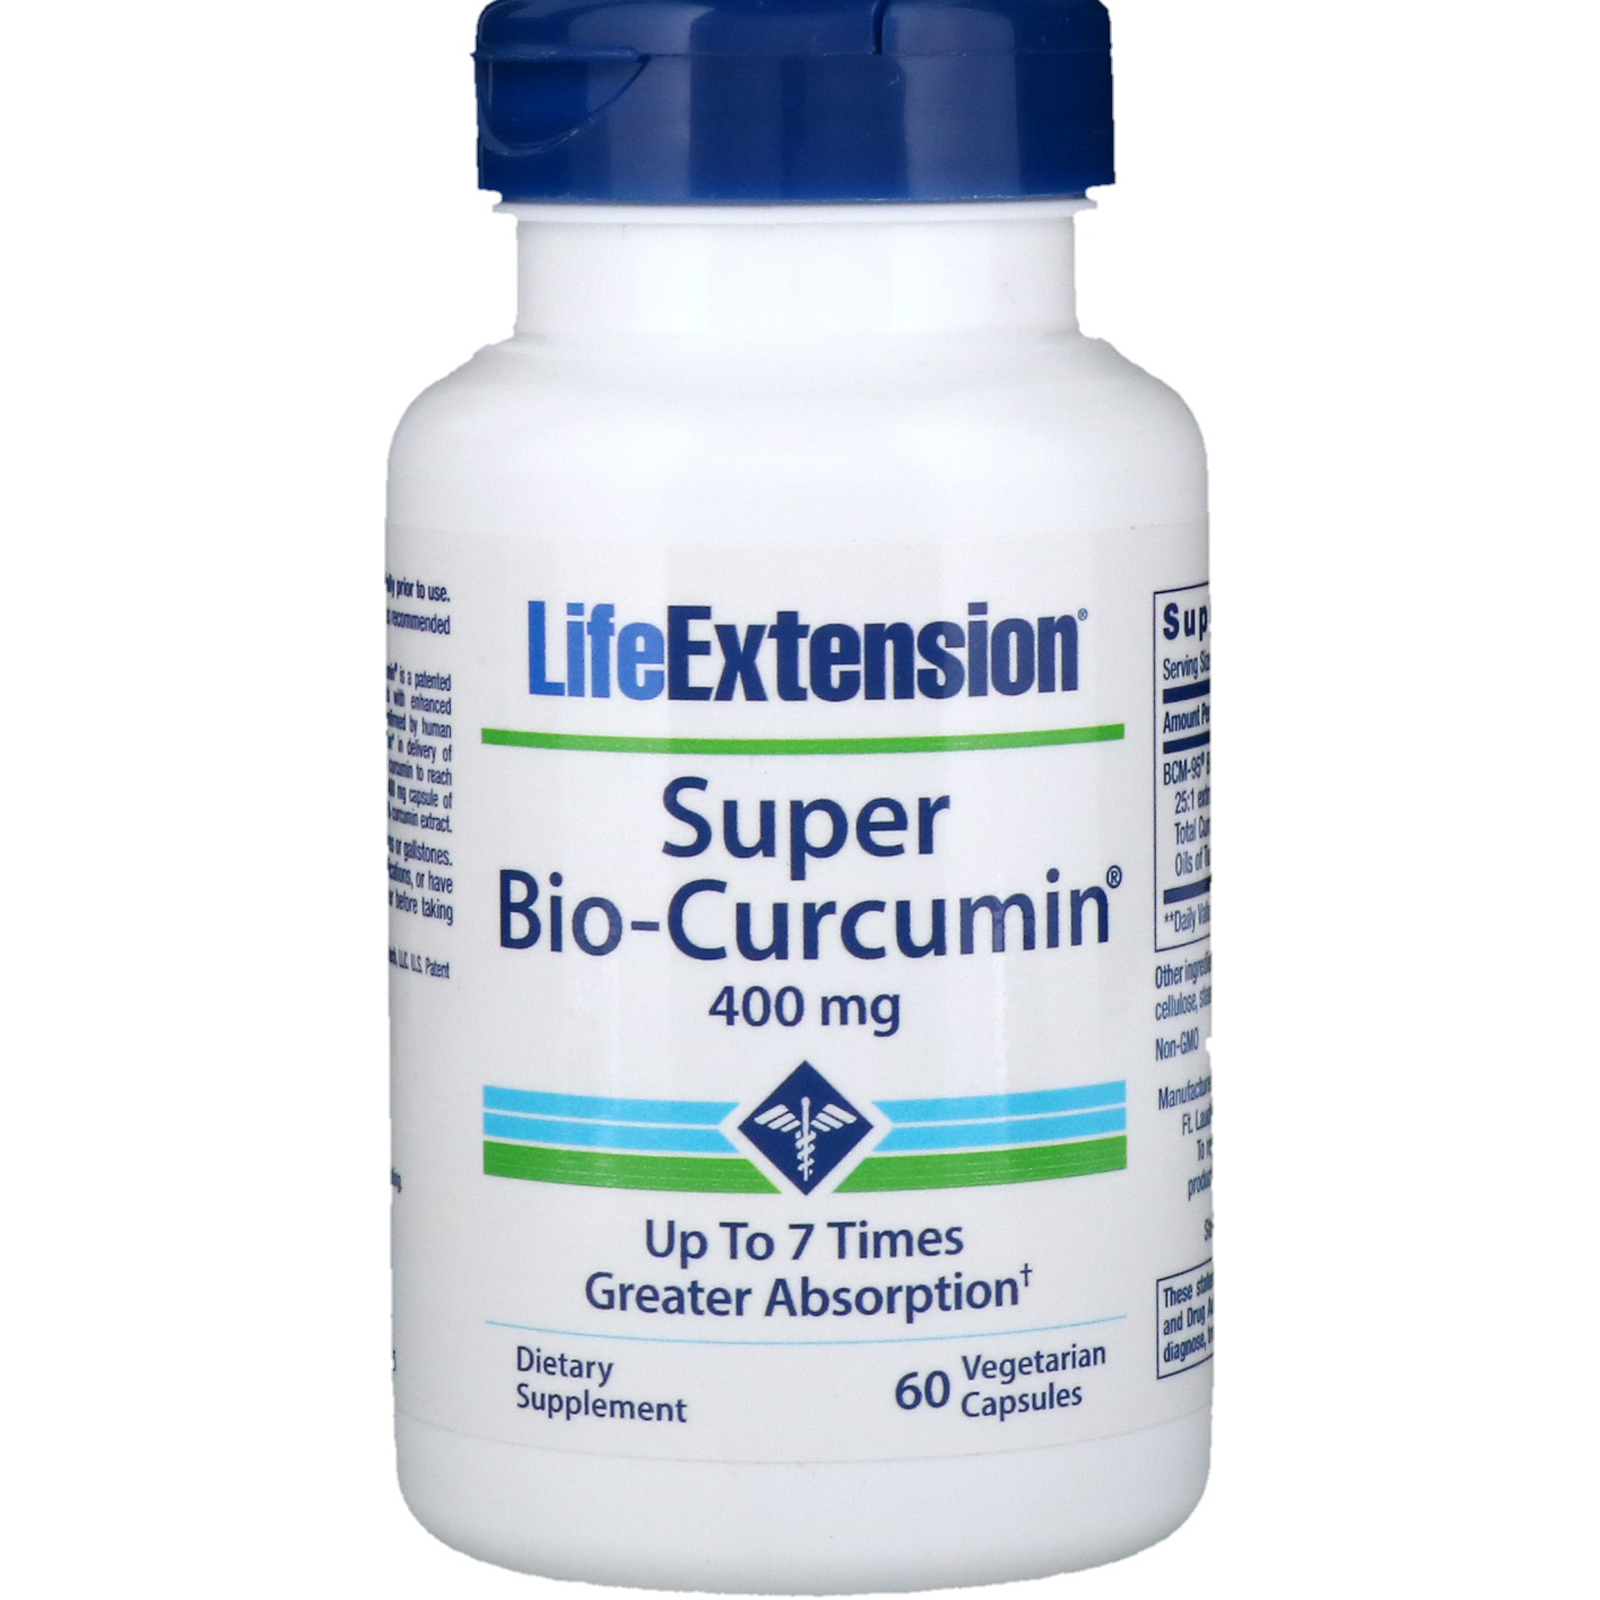 Life Extension, Super Bio-Curcumin, 400 mg, 60 Vegetable